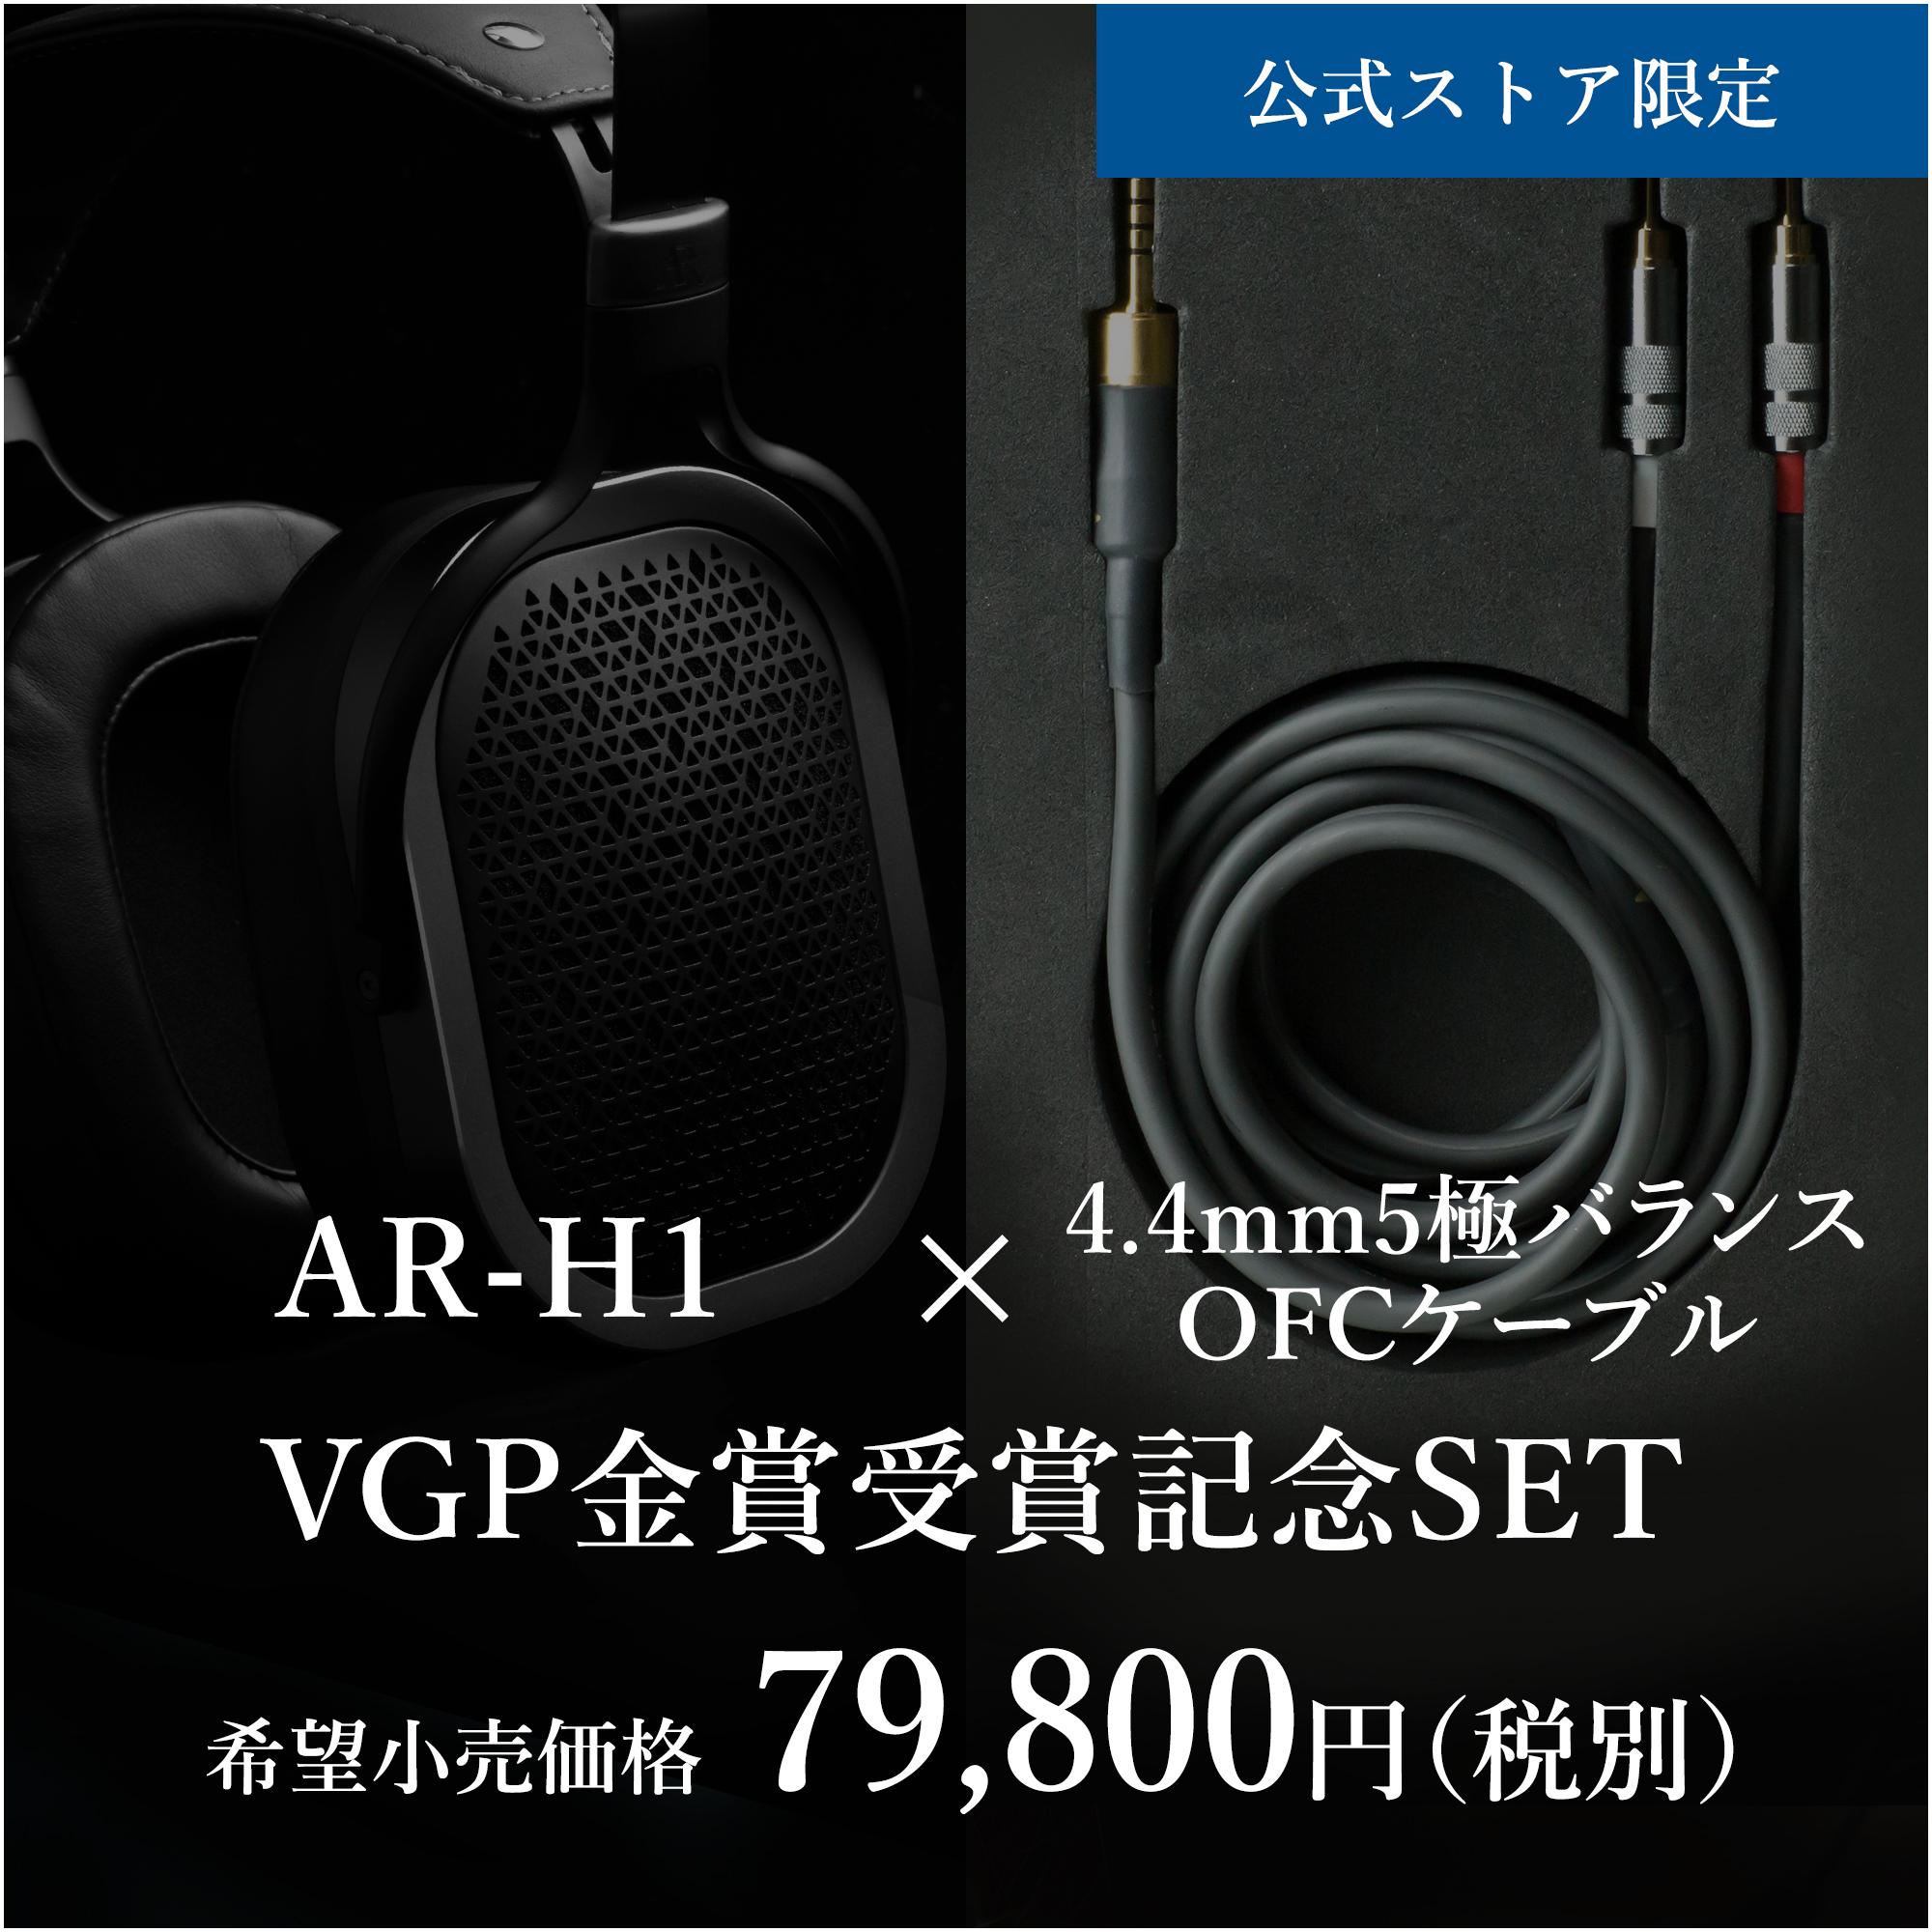 VGP2018金賞受賞記念プレゼント